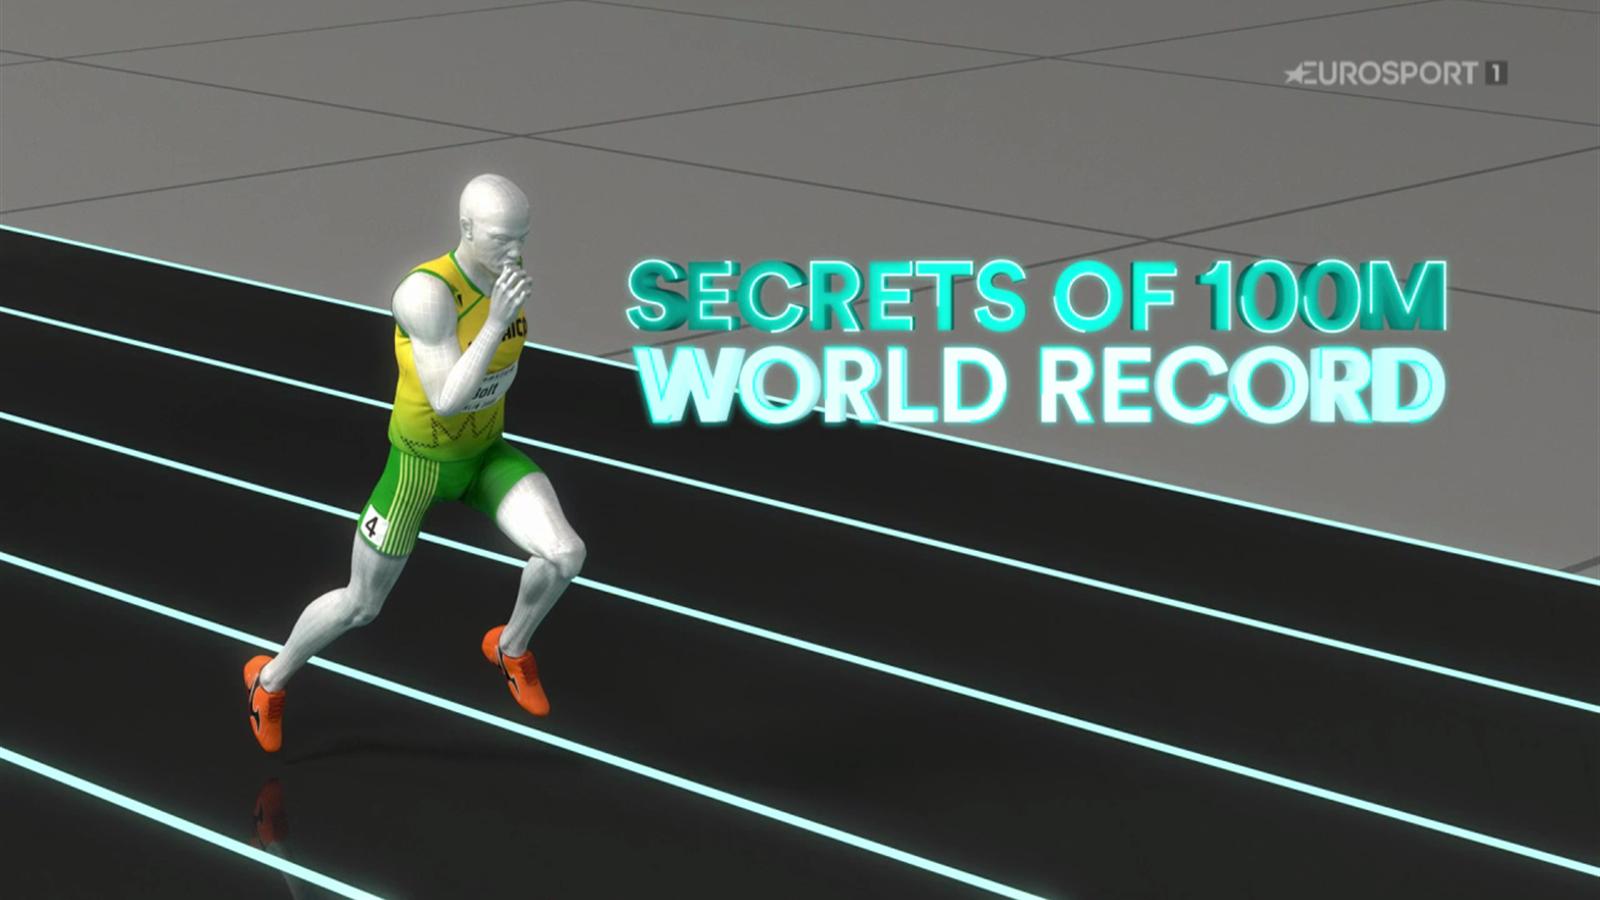 VIDEO - Sports Explainer: How Usain Bolt smashed the 100m world record - Video Eurosport